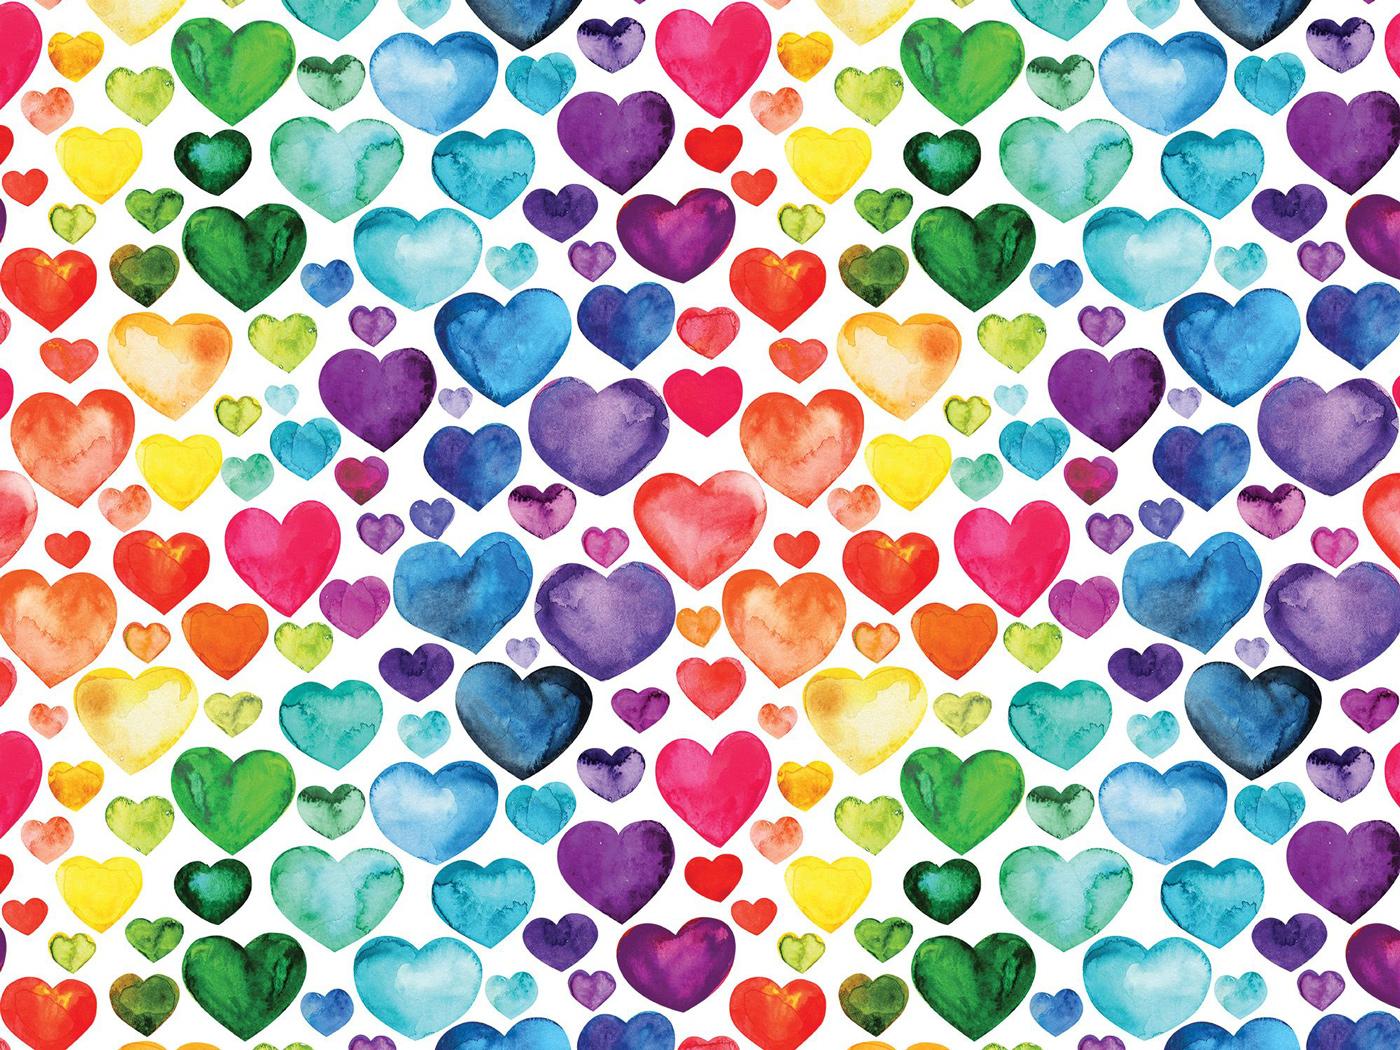 Rainbow Hearts Graphics / Illustration Jigsaw Puzzle